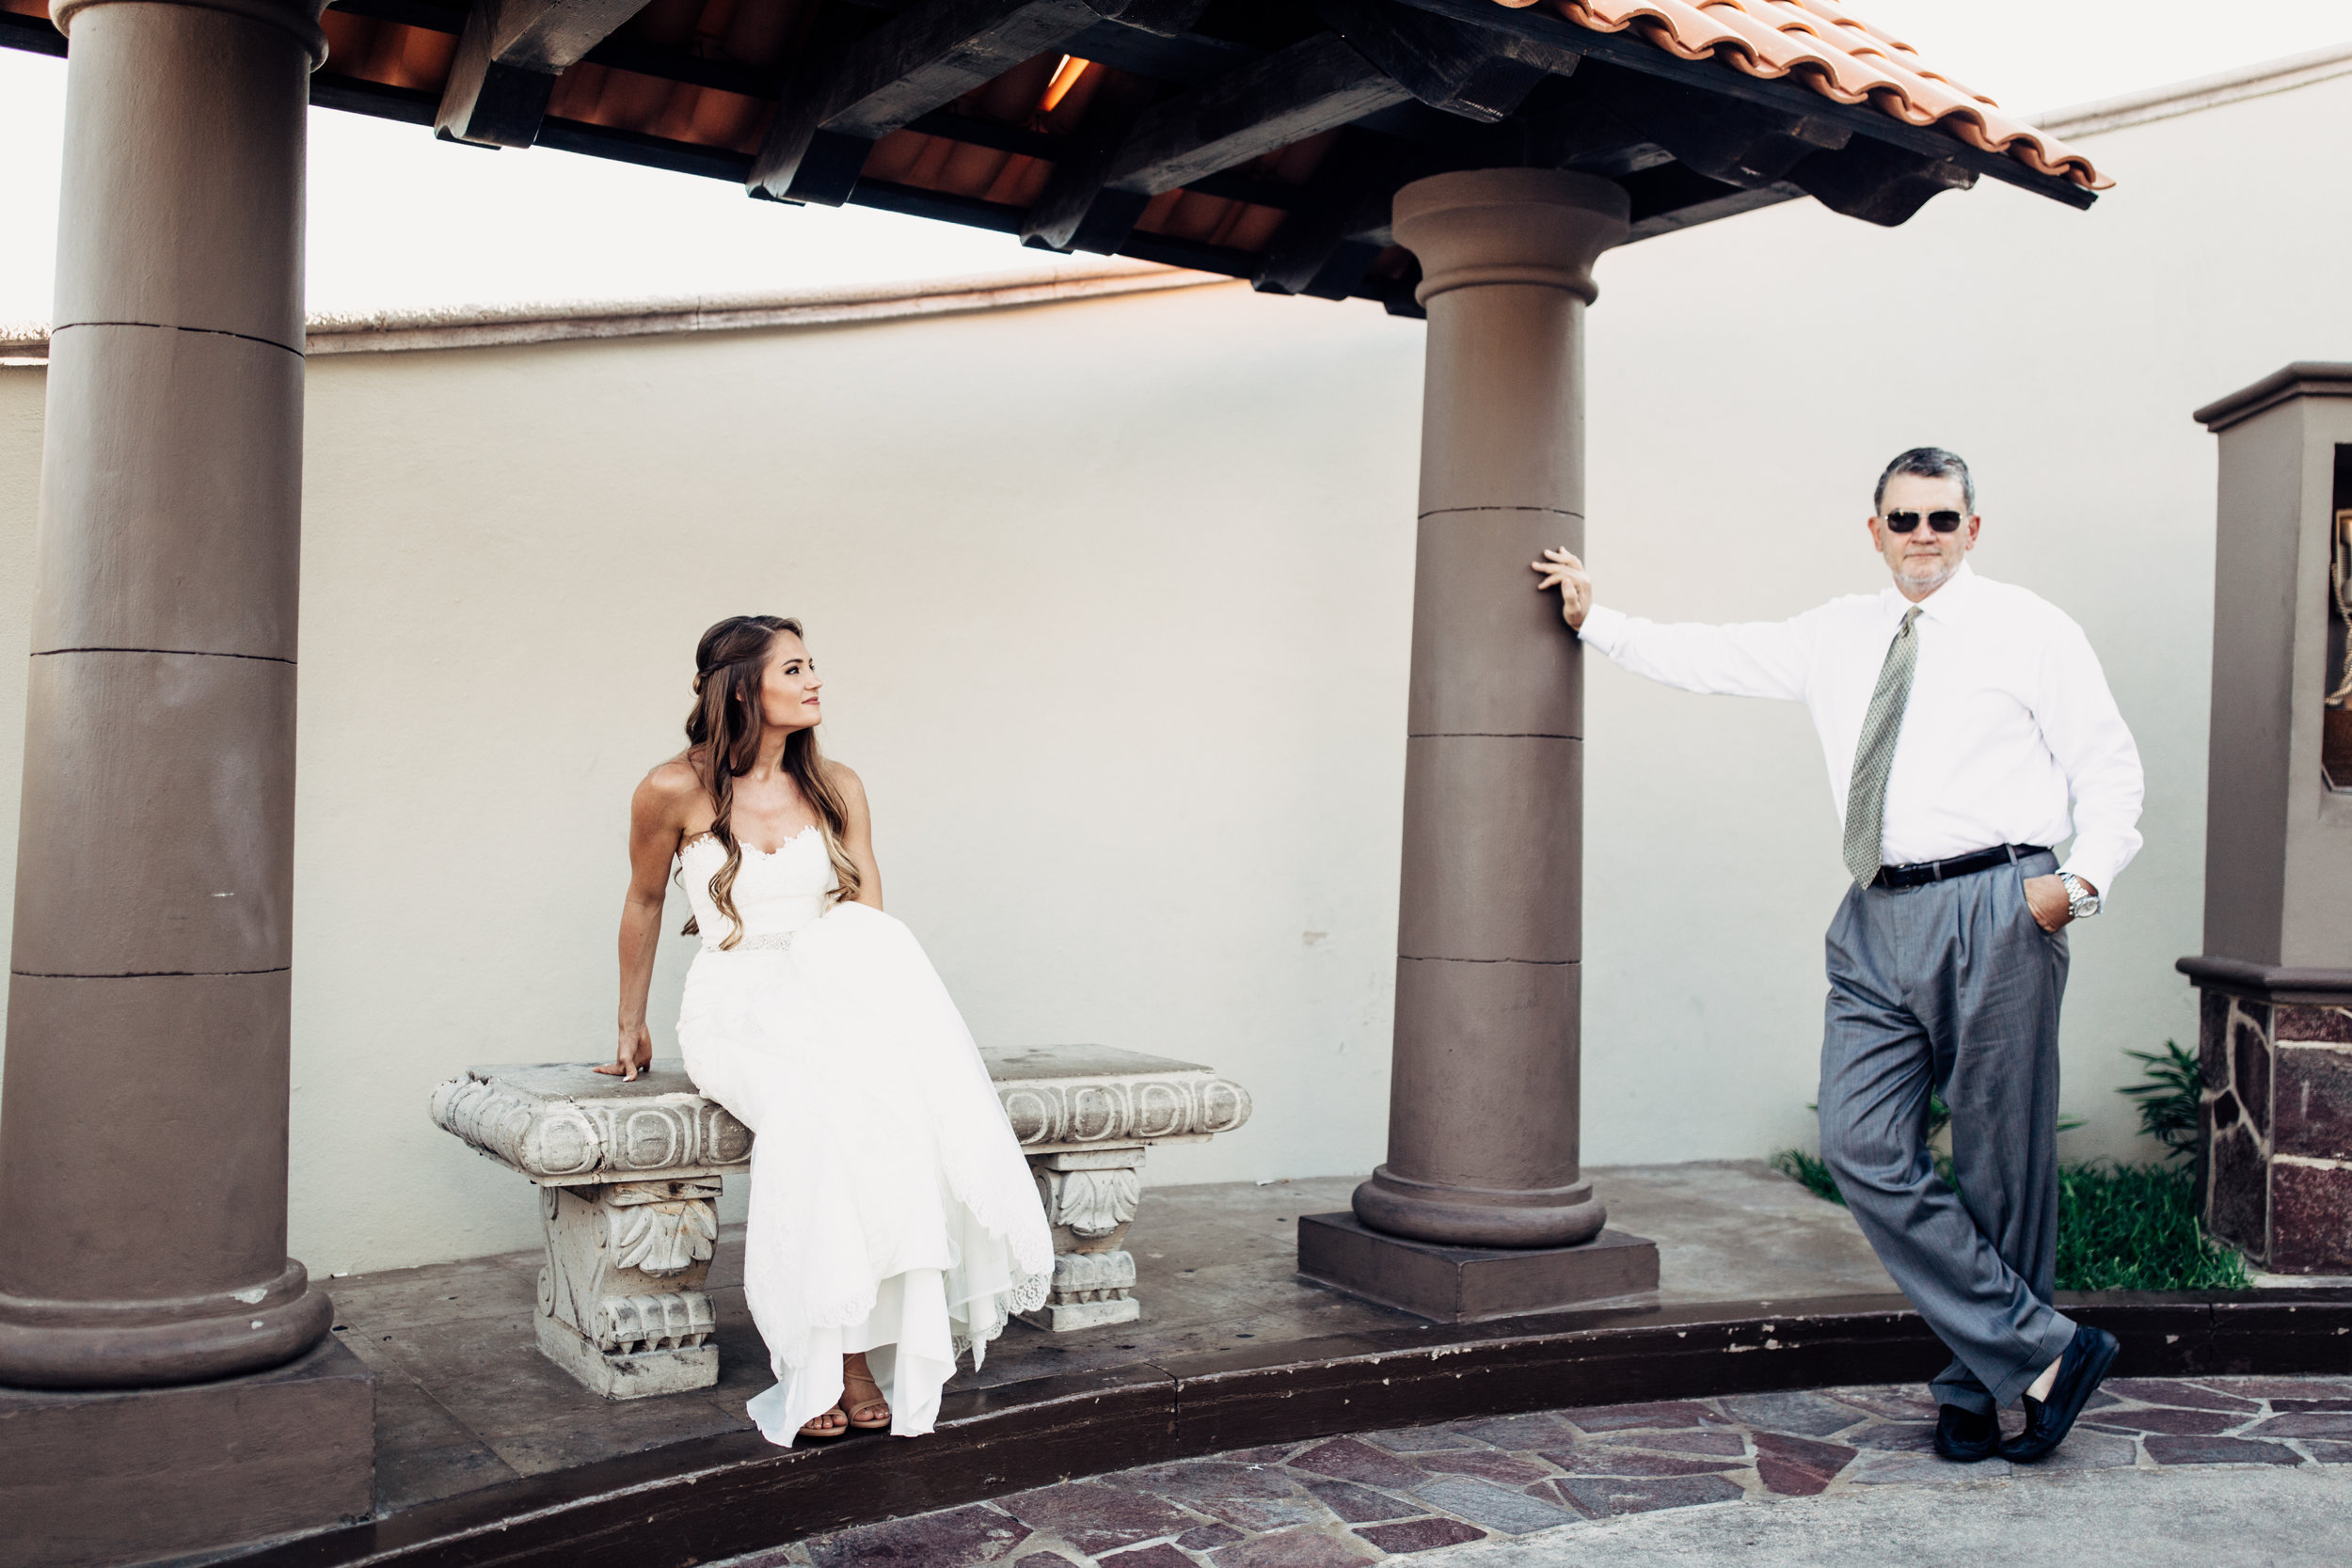 pueblo-bonito-sunset-beach-wedding-cabo-san-lucas260.jpg